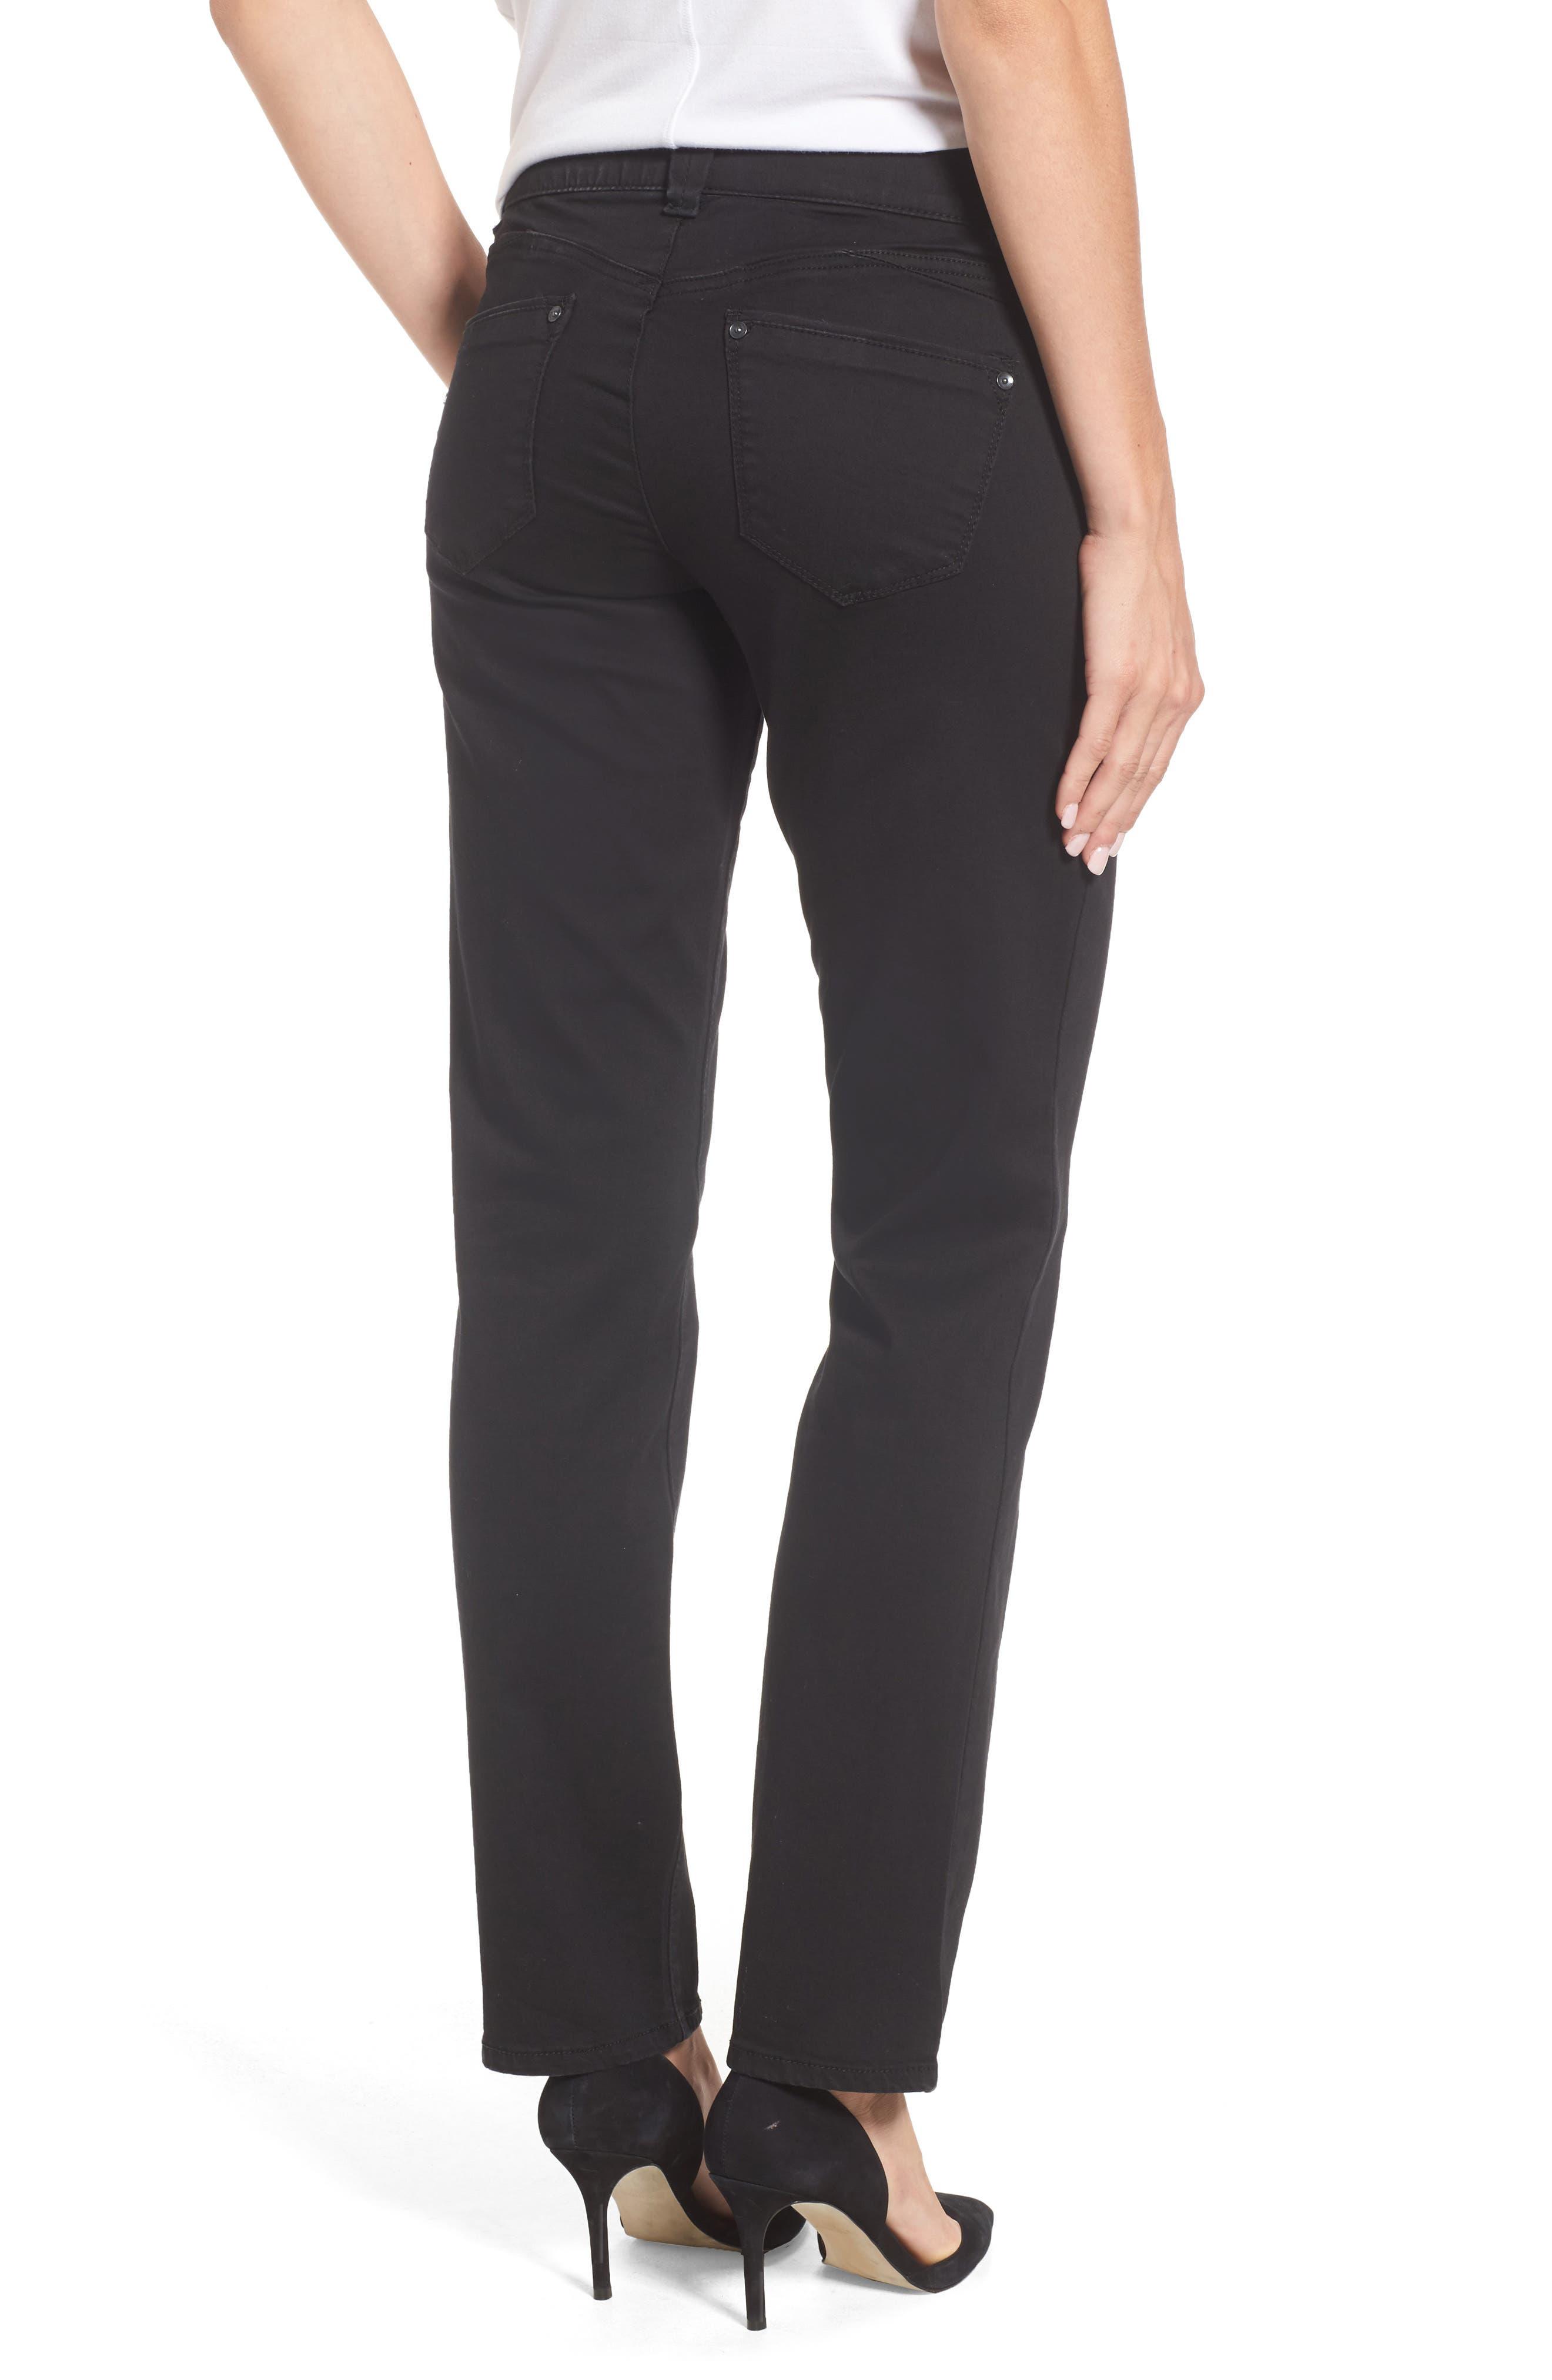 Alternate Image 2  - Wit & Wisdom Ab-solution Straight Leg Jeans (Nordstrom Exclusive) (Regular & Petite)